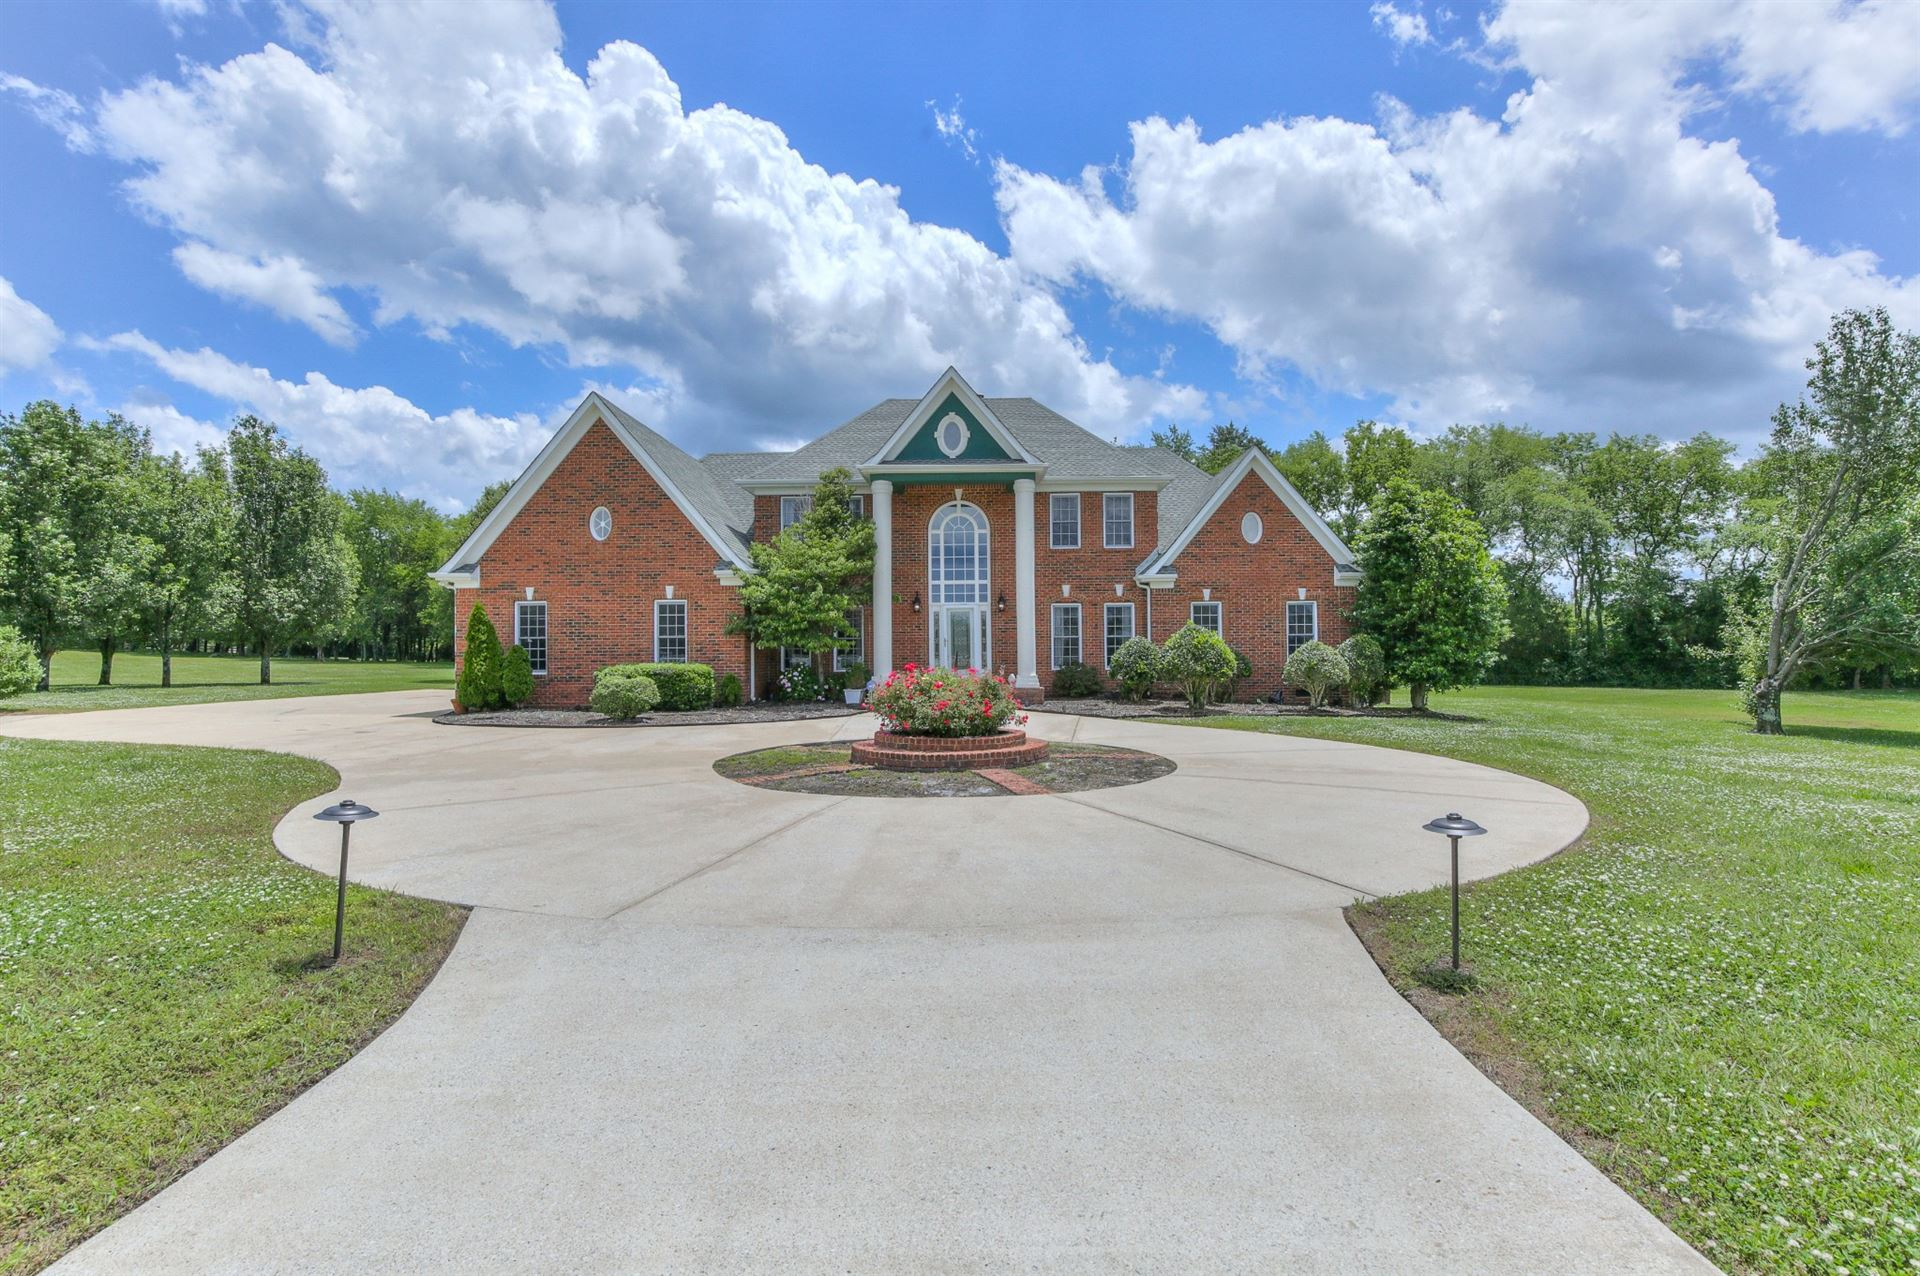 206 Churchill Farms Dr, Murfreesboro, TN 37127 - MLS#: 2246082